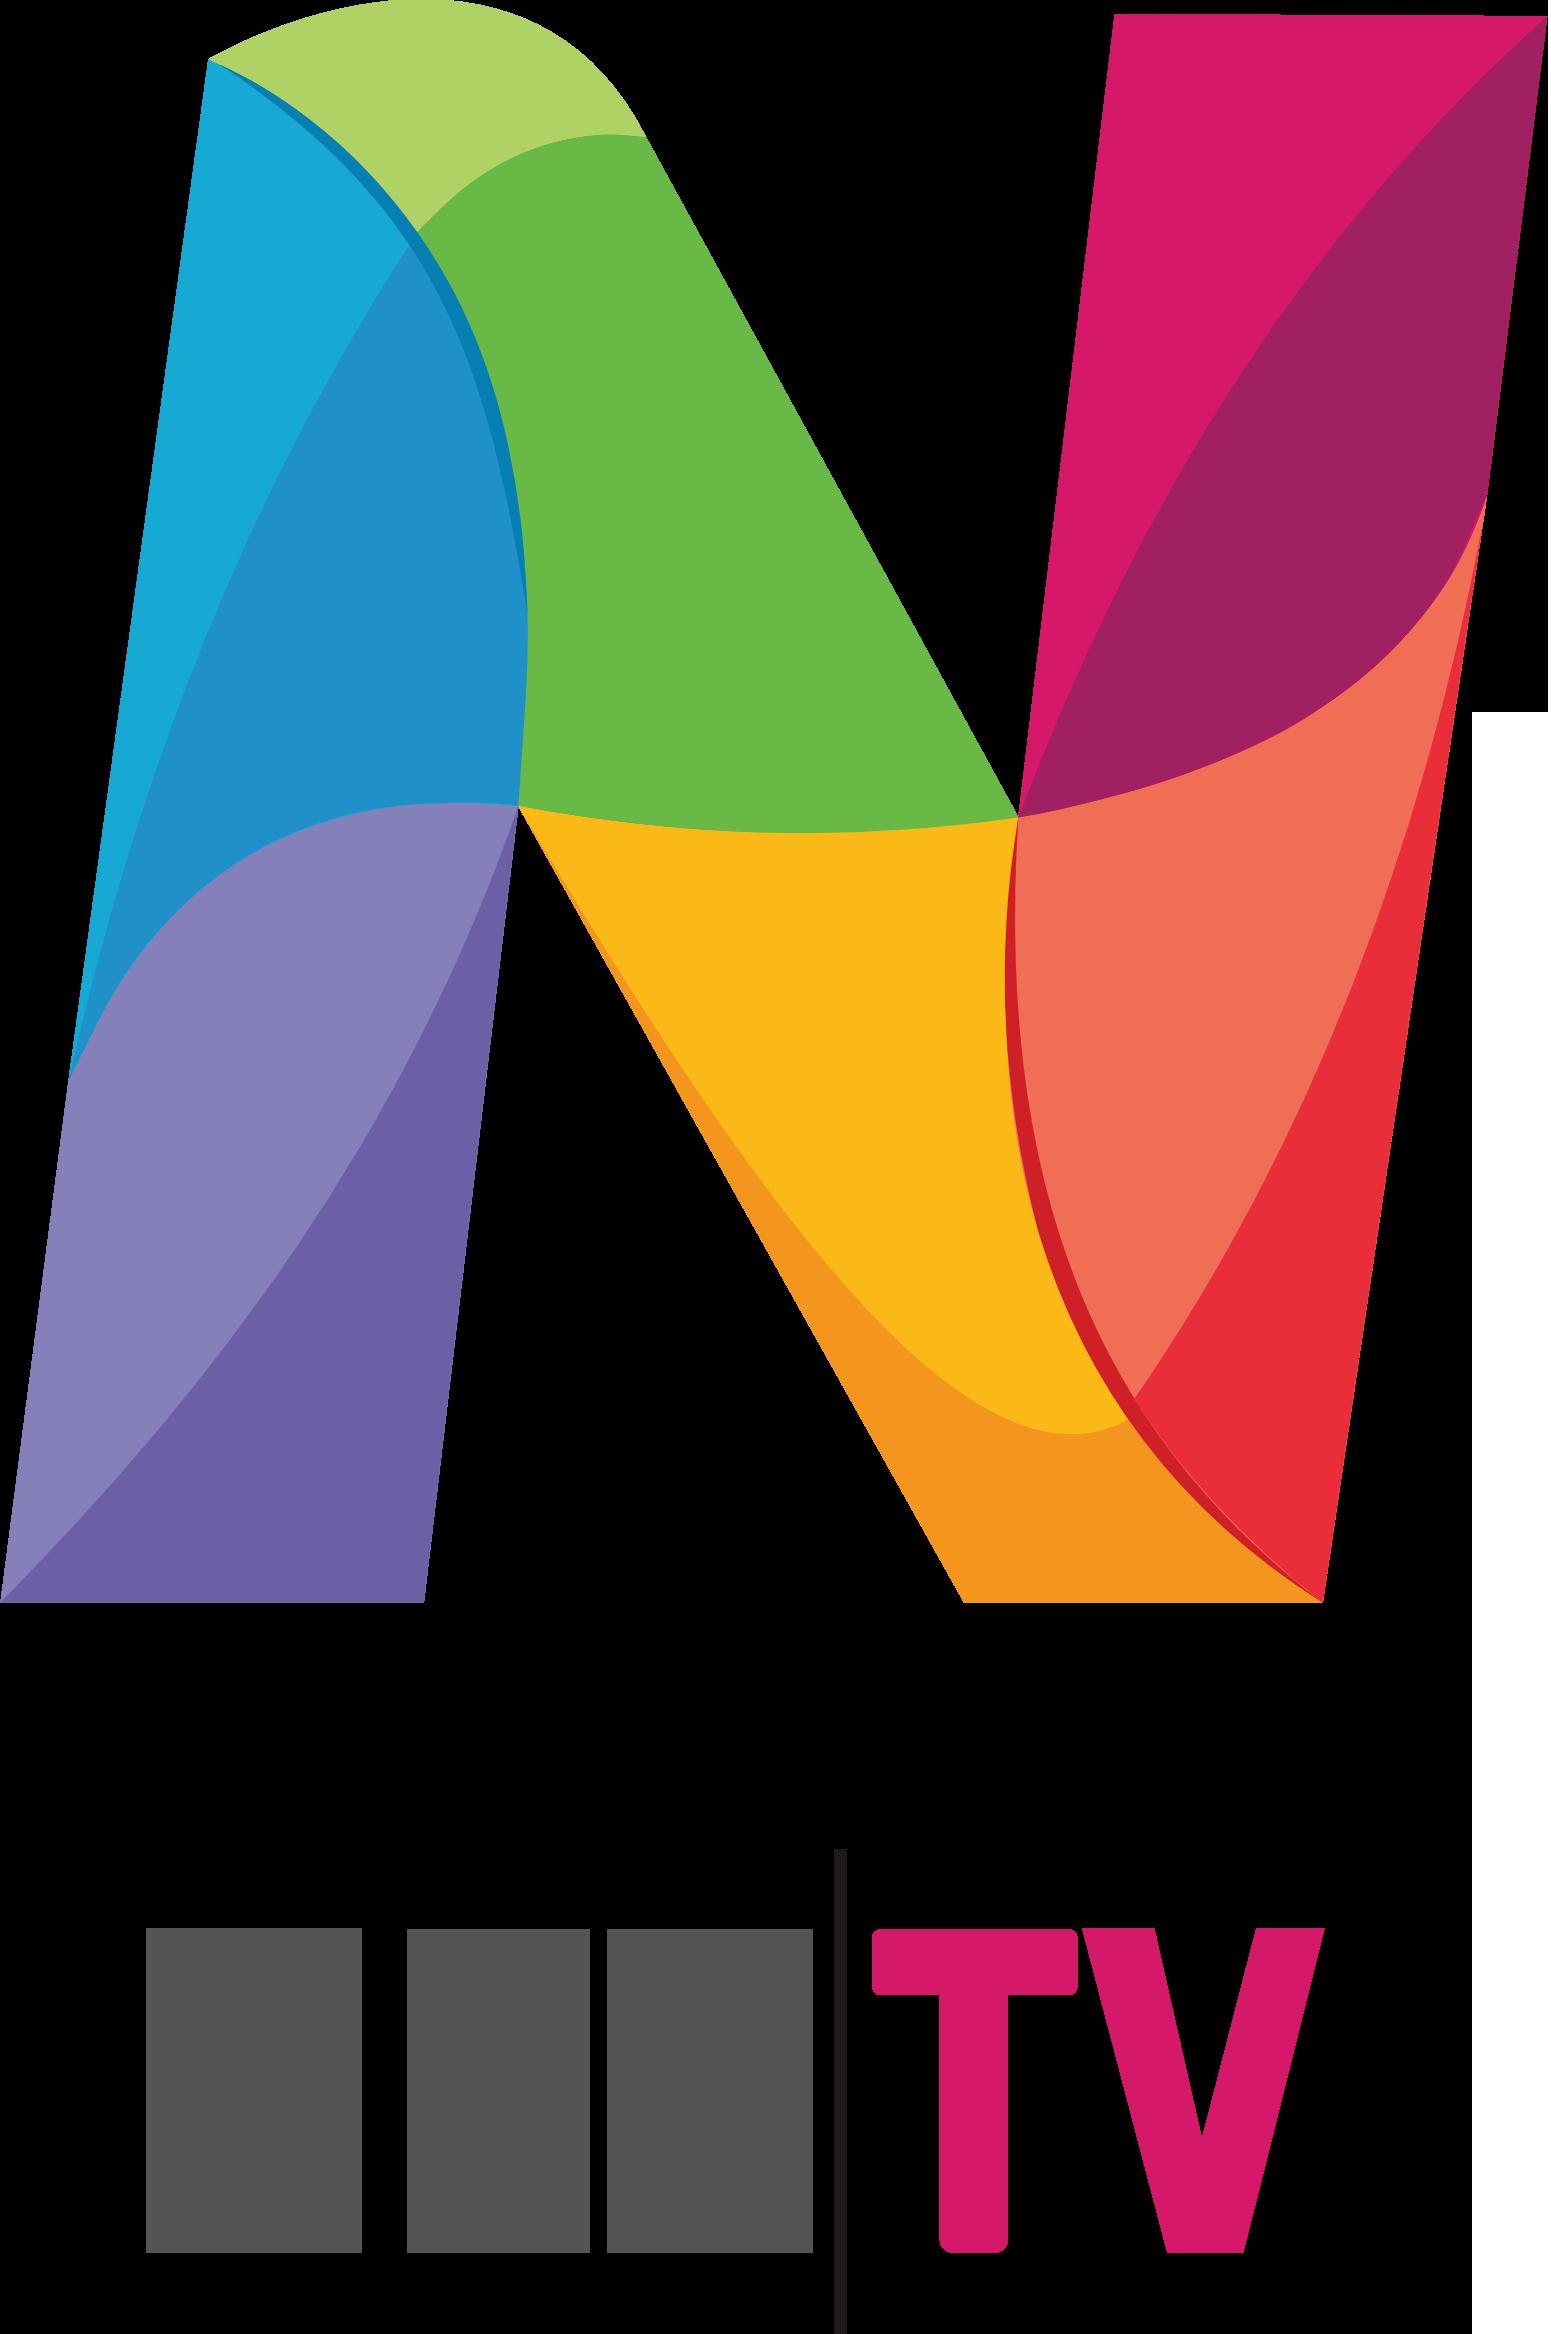 20 X 20 20   Net Tv Argentina Logo Clipart   Full Size Clipart ...